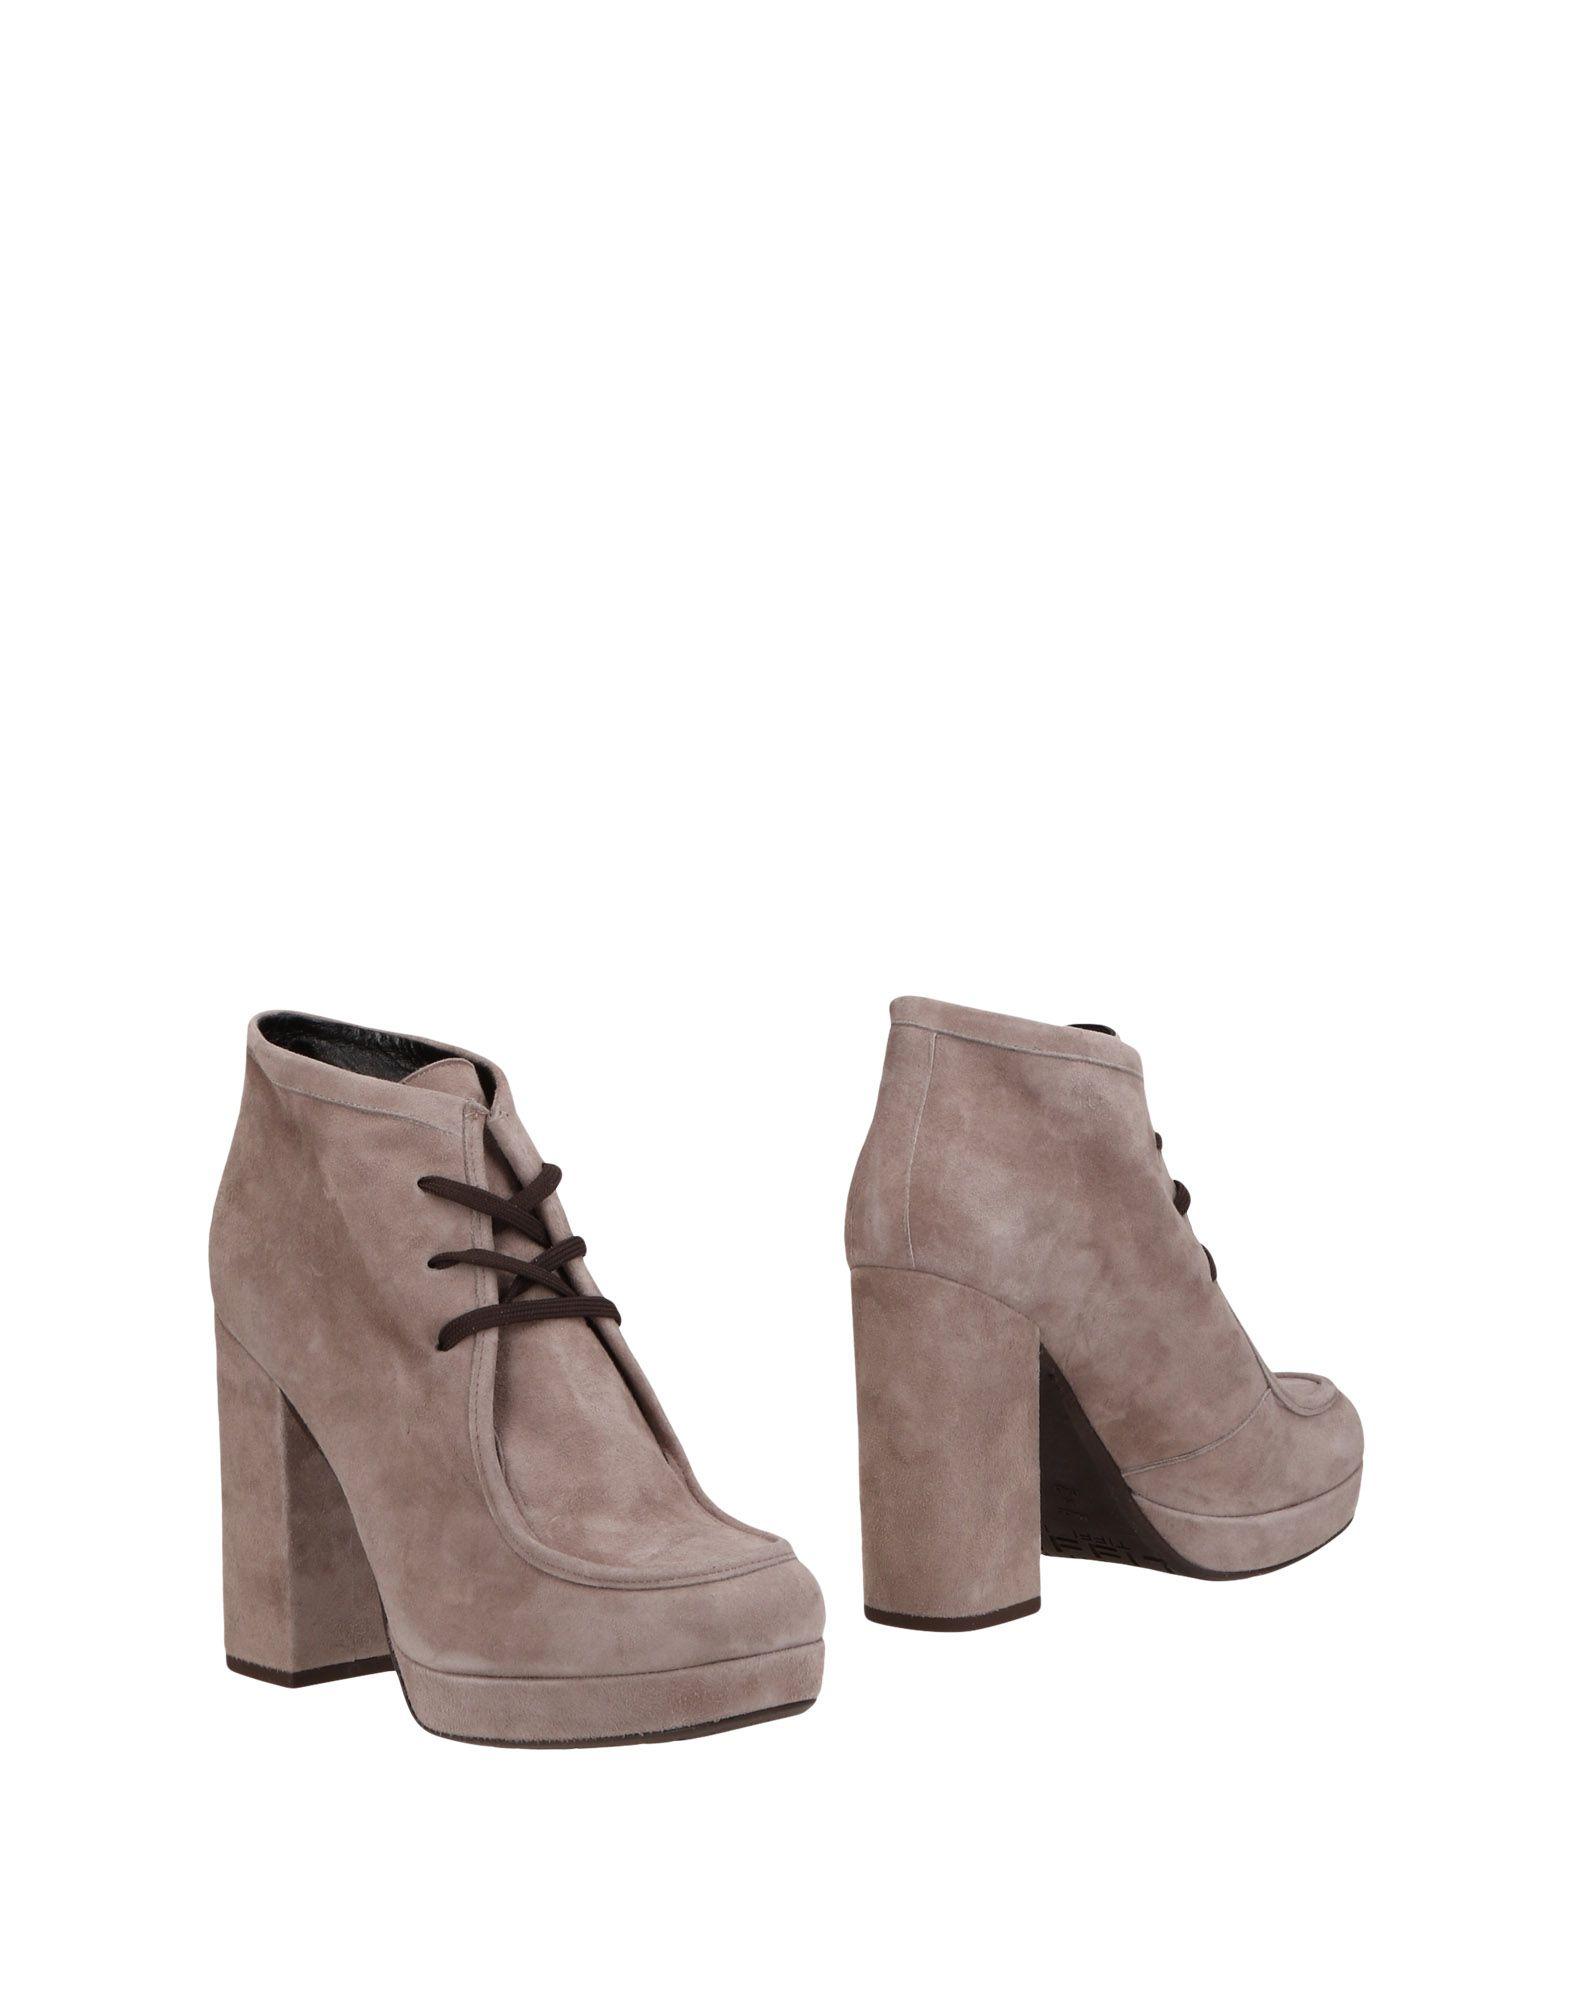 Moda Stivaletti Tiffi Donna - 11495555GW